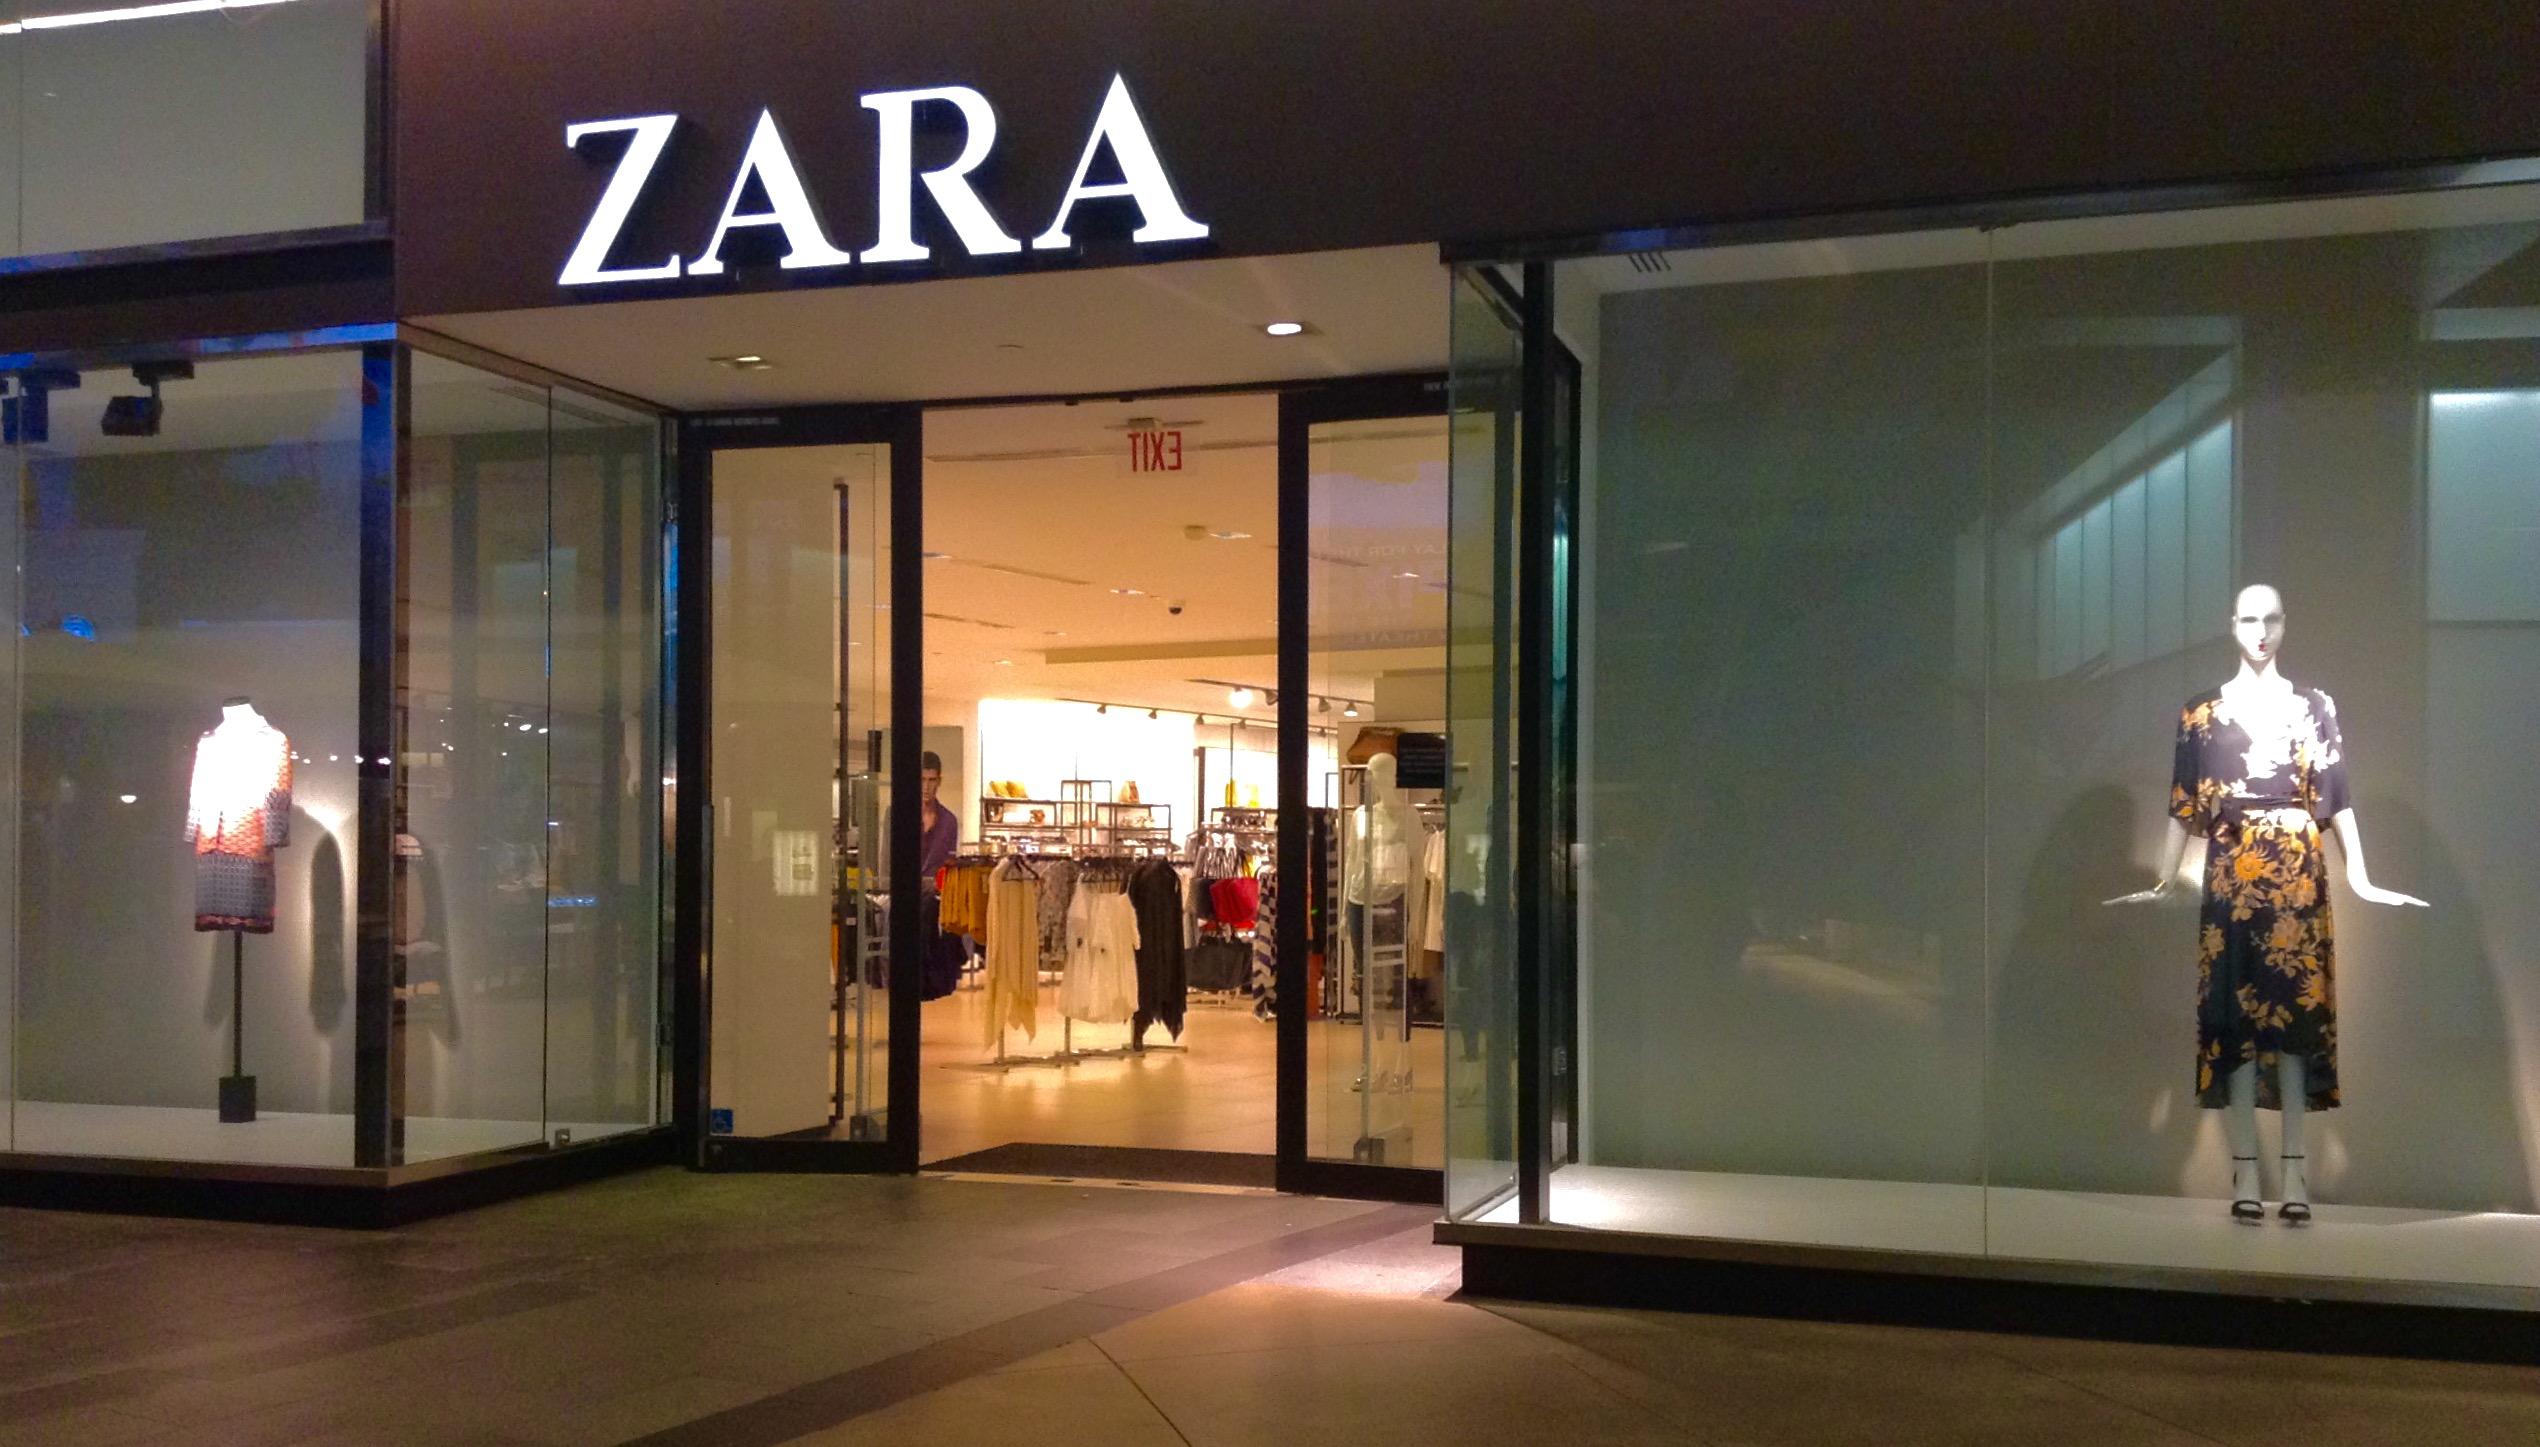 Zara Clothing Store Los Angeles California 6 2015 By